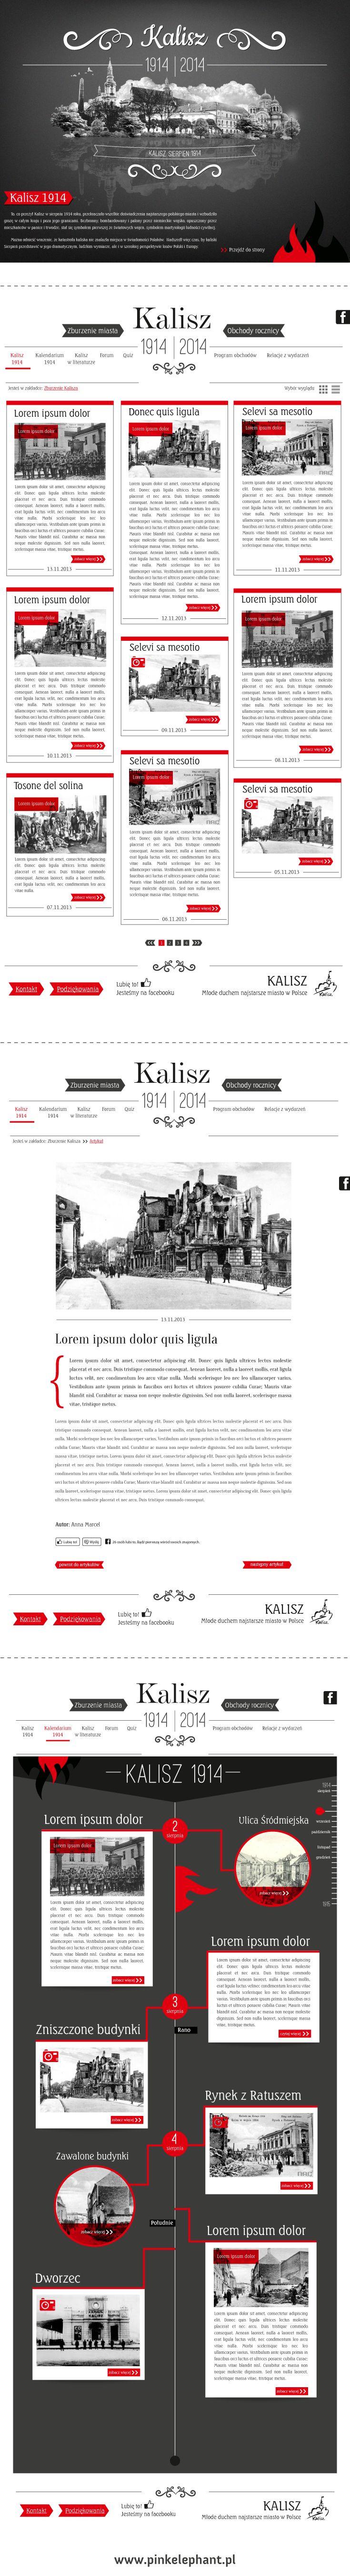 Official website of the destruction of Kalisz    Design: www.pinkelephant.pl /web design /layout /portfolio /web /design /logo